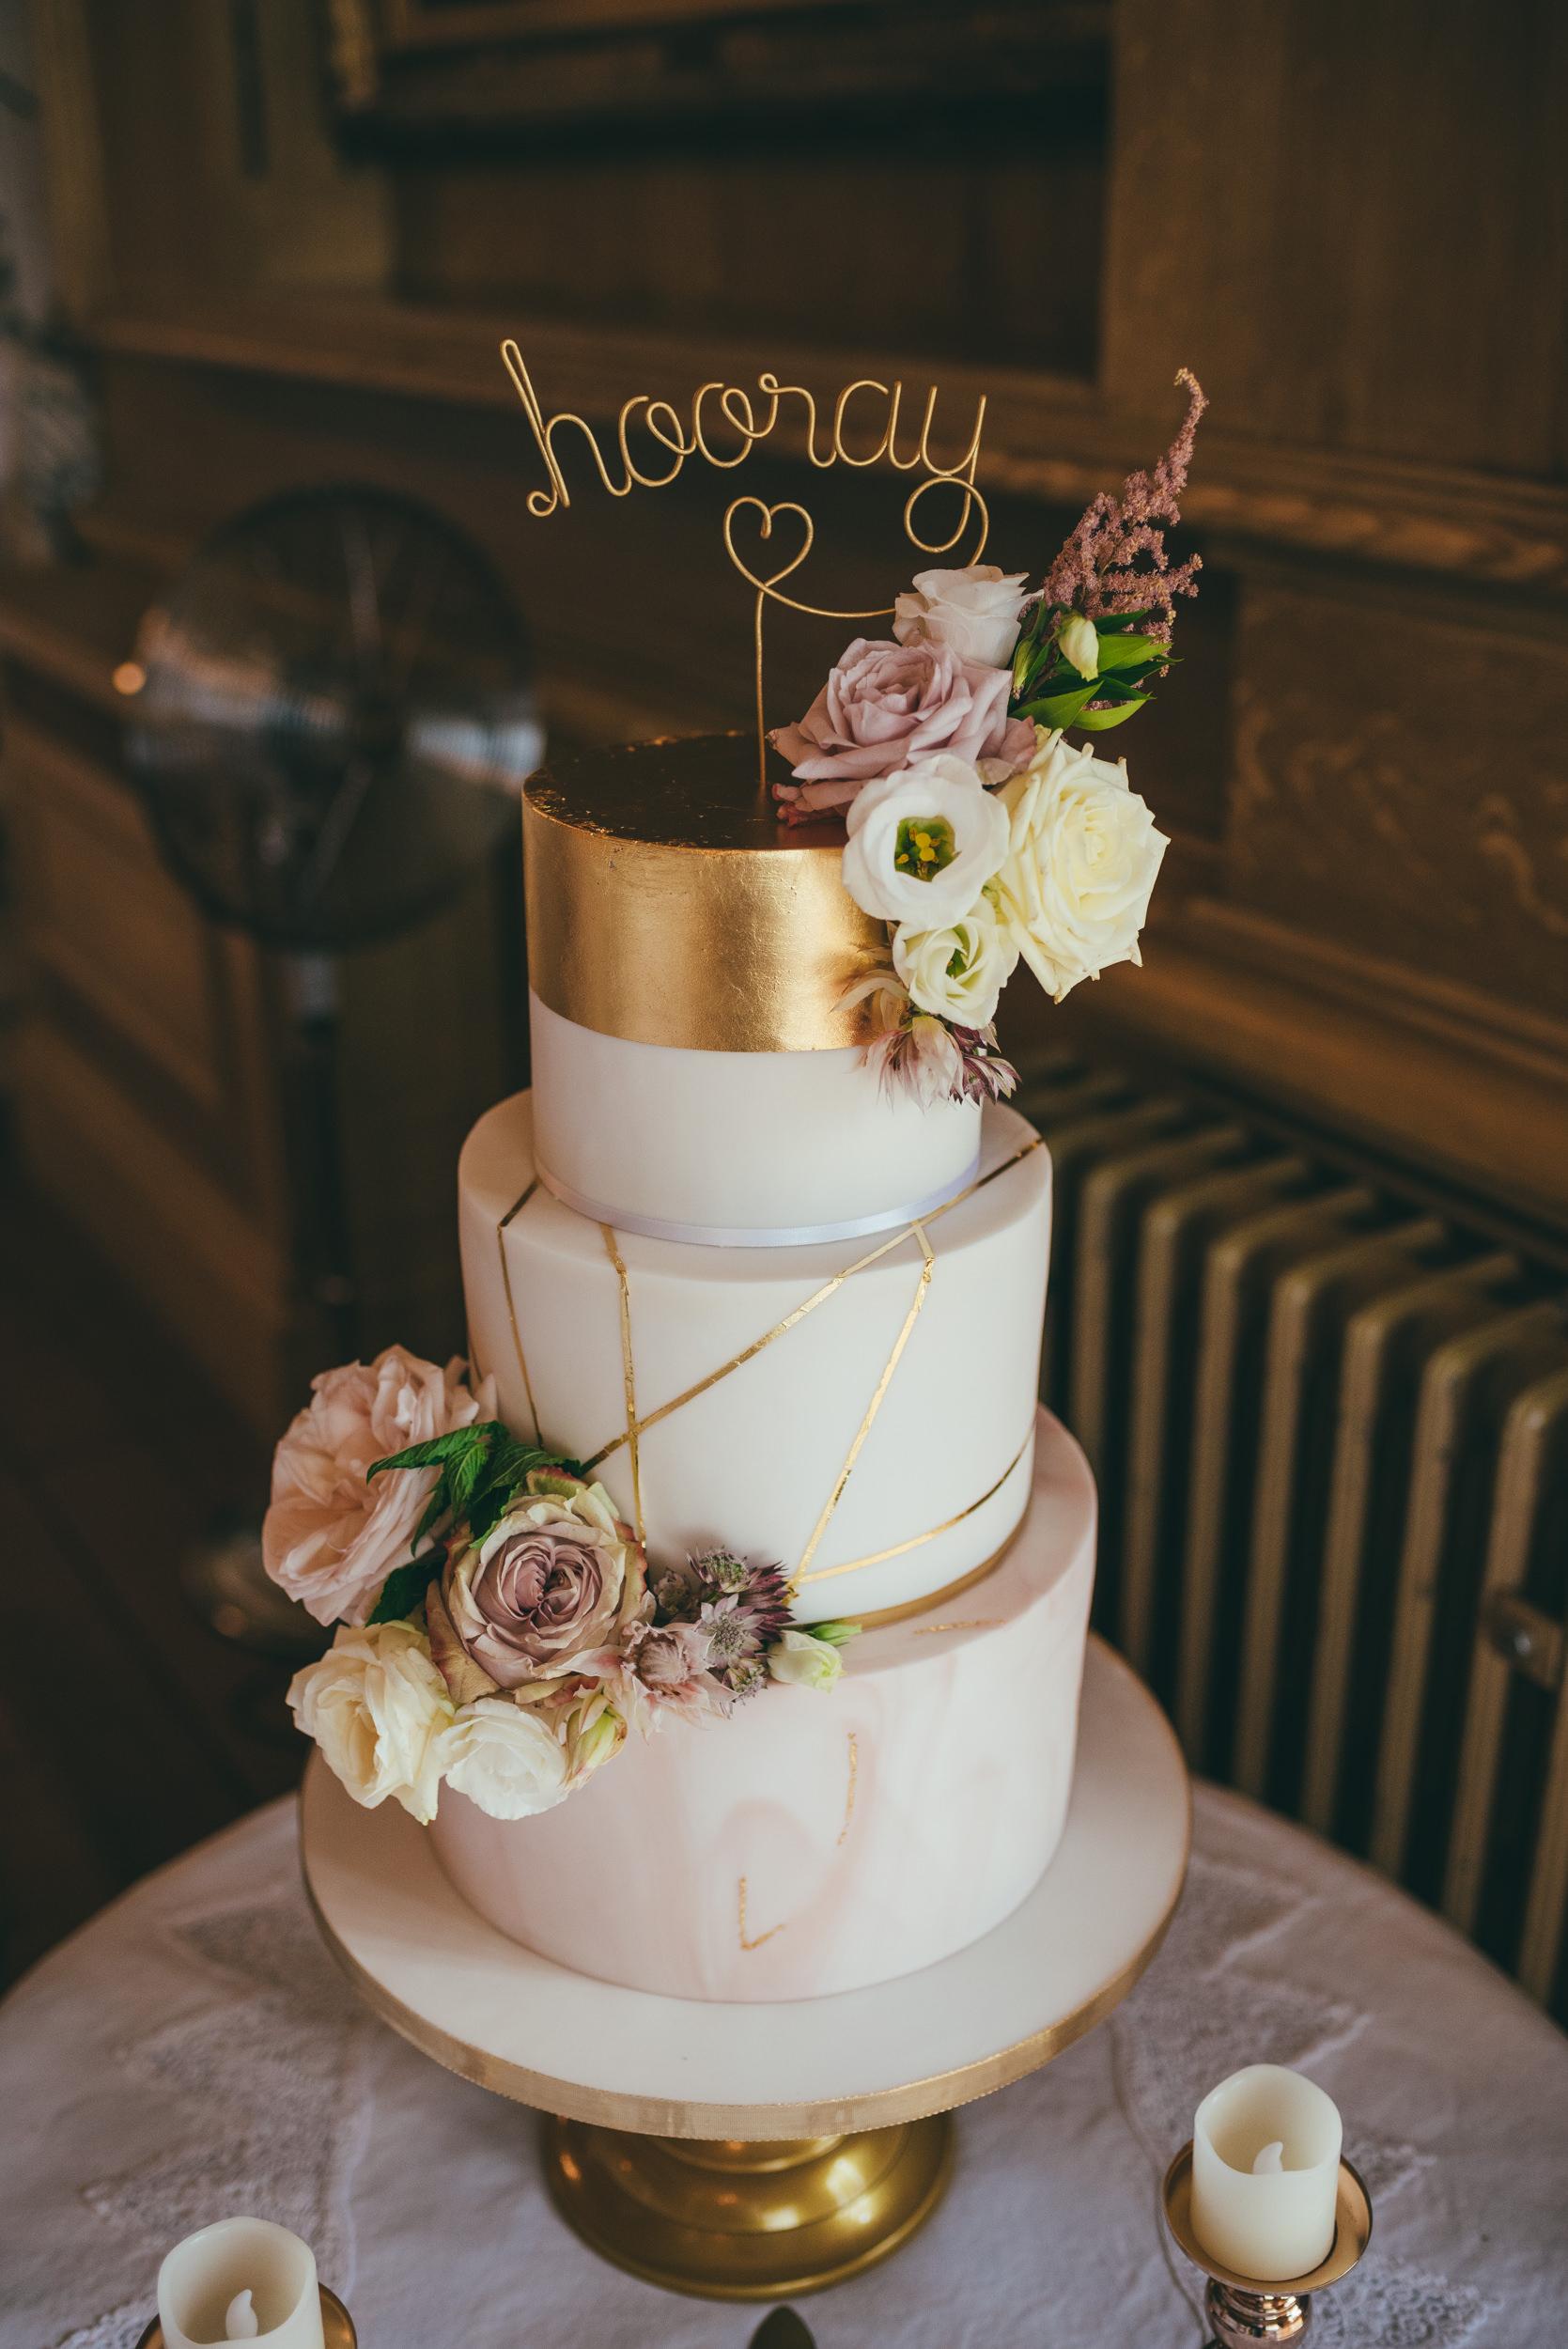 Werdding cakle at a wedding at Harlaxton Manor